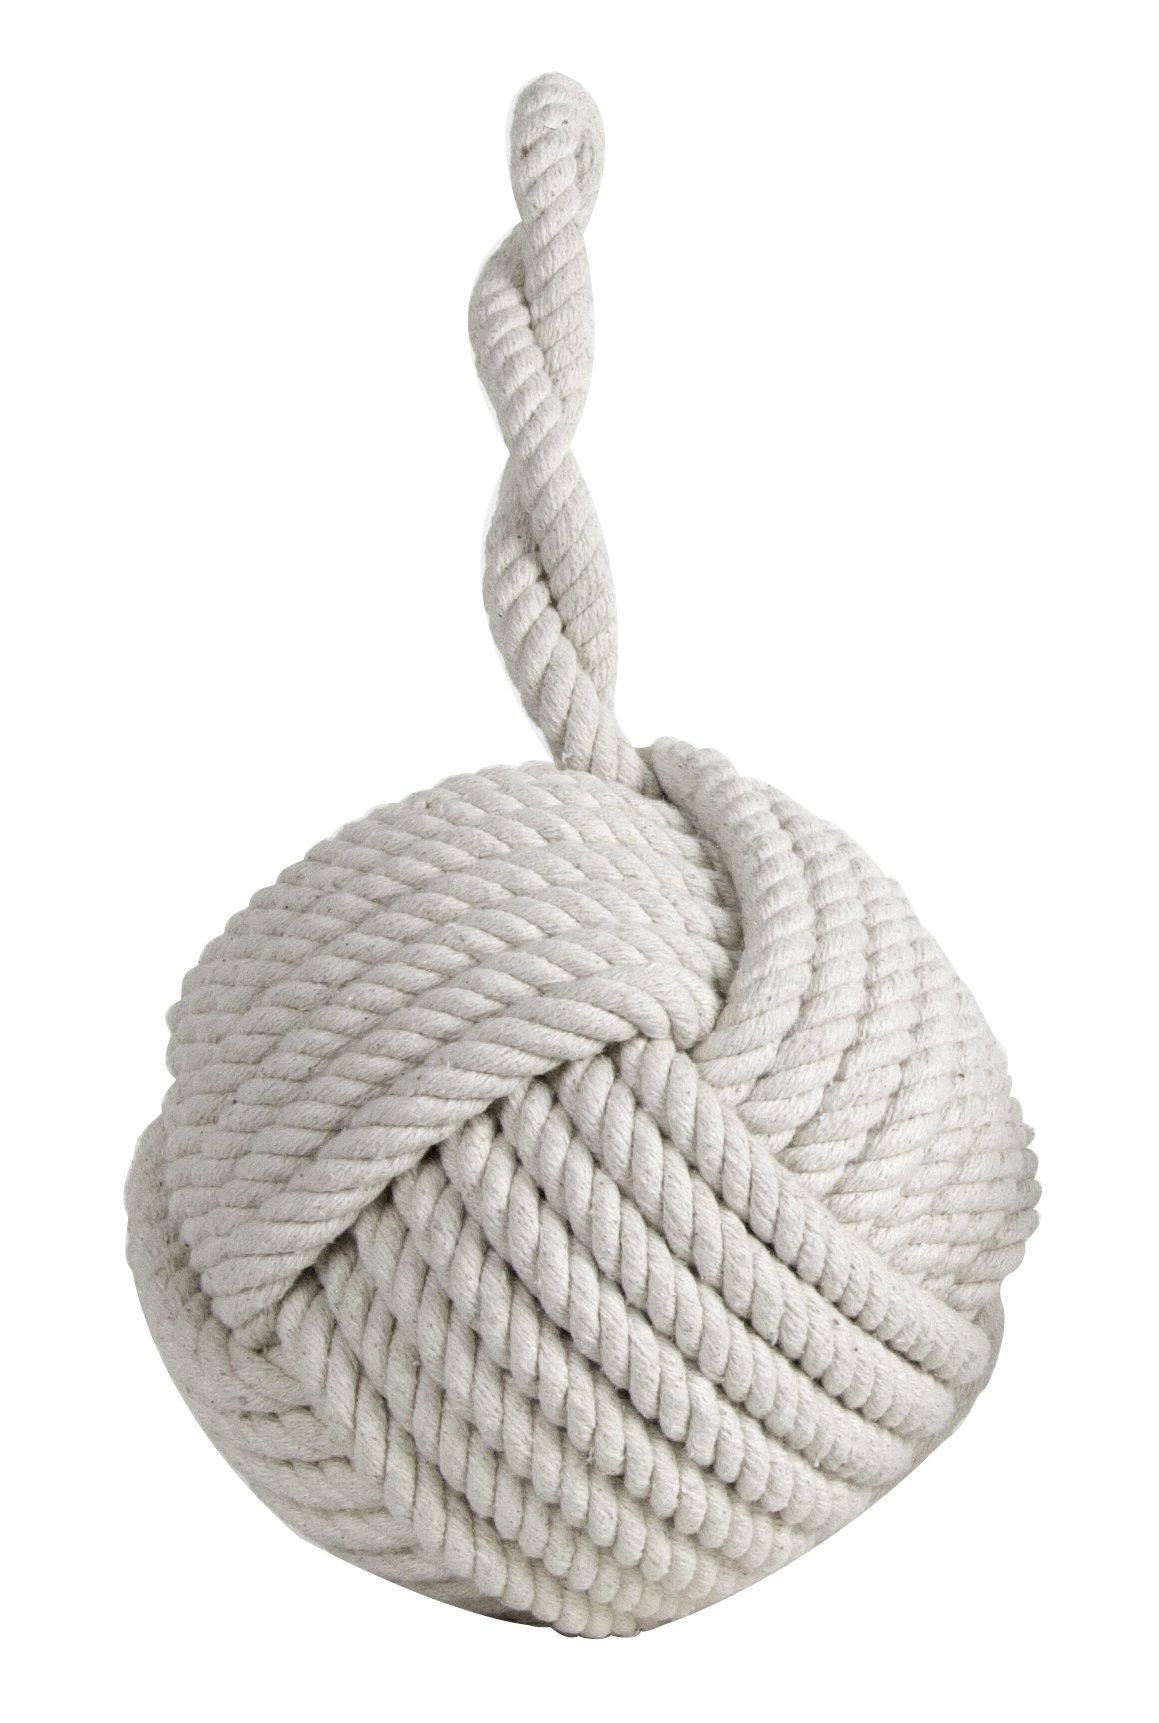 Authentic Models Monkey Fist Nautical Knot Doorstop Cotton